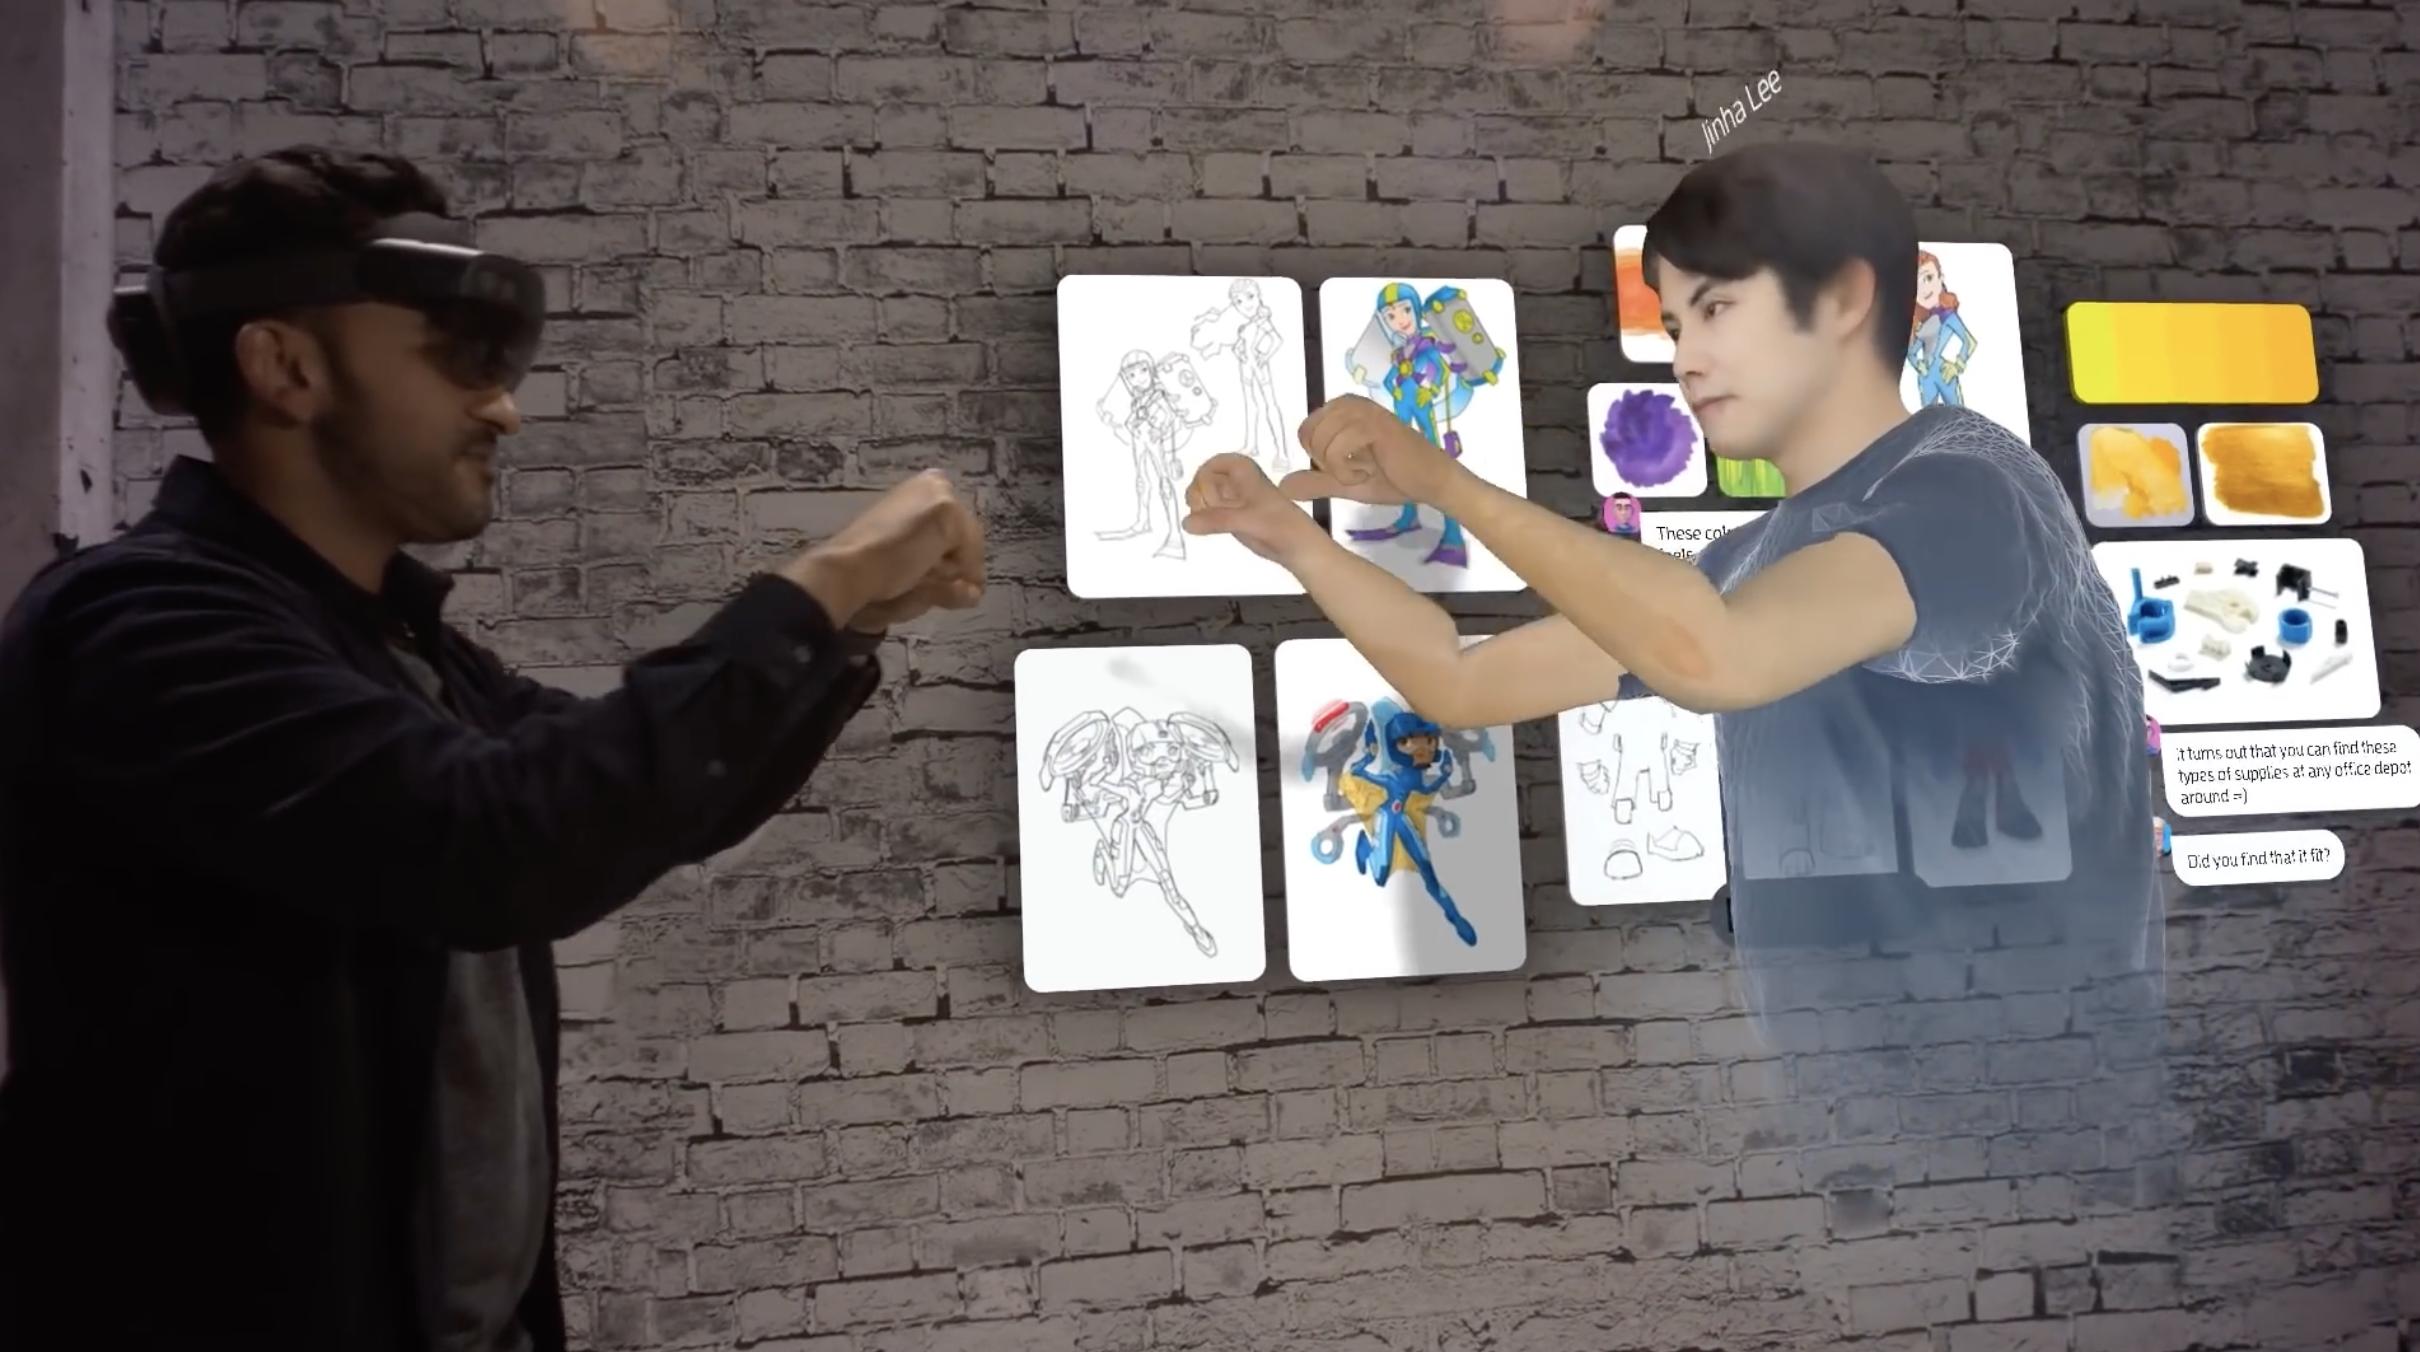 【钛媒体视频】微软HoloLens 2将发售,MR协同办公展示